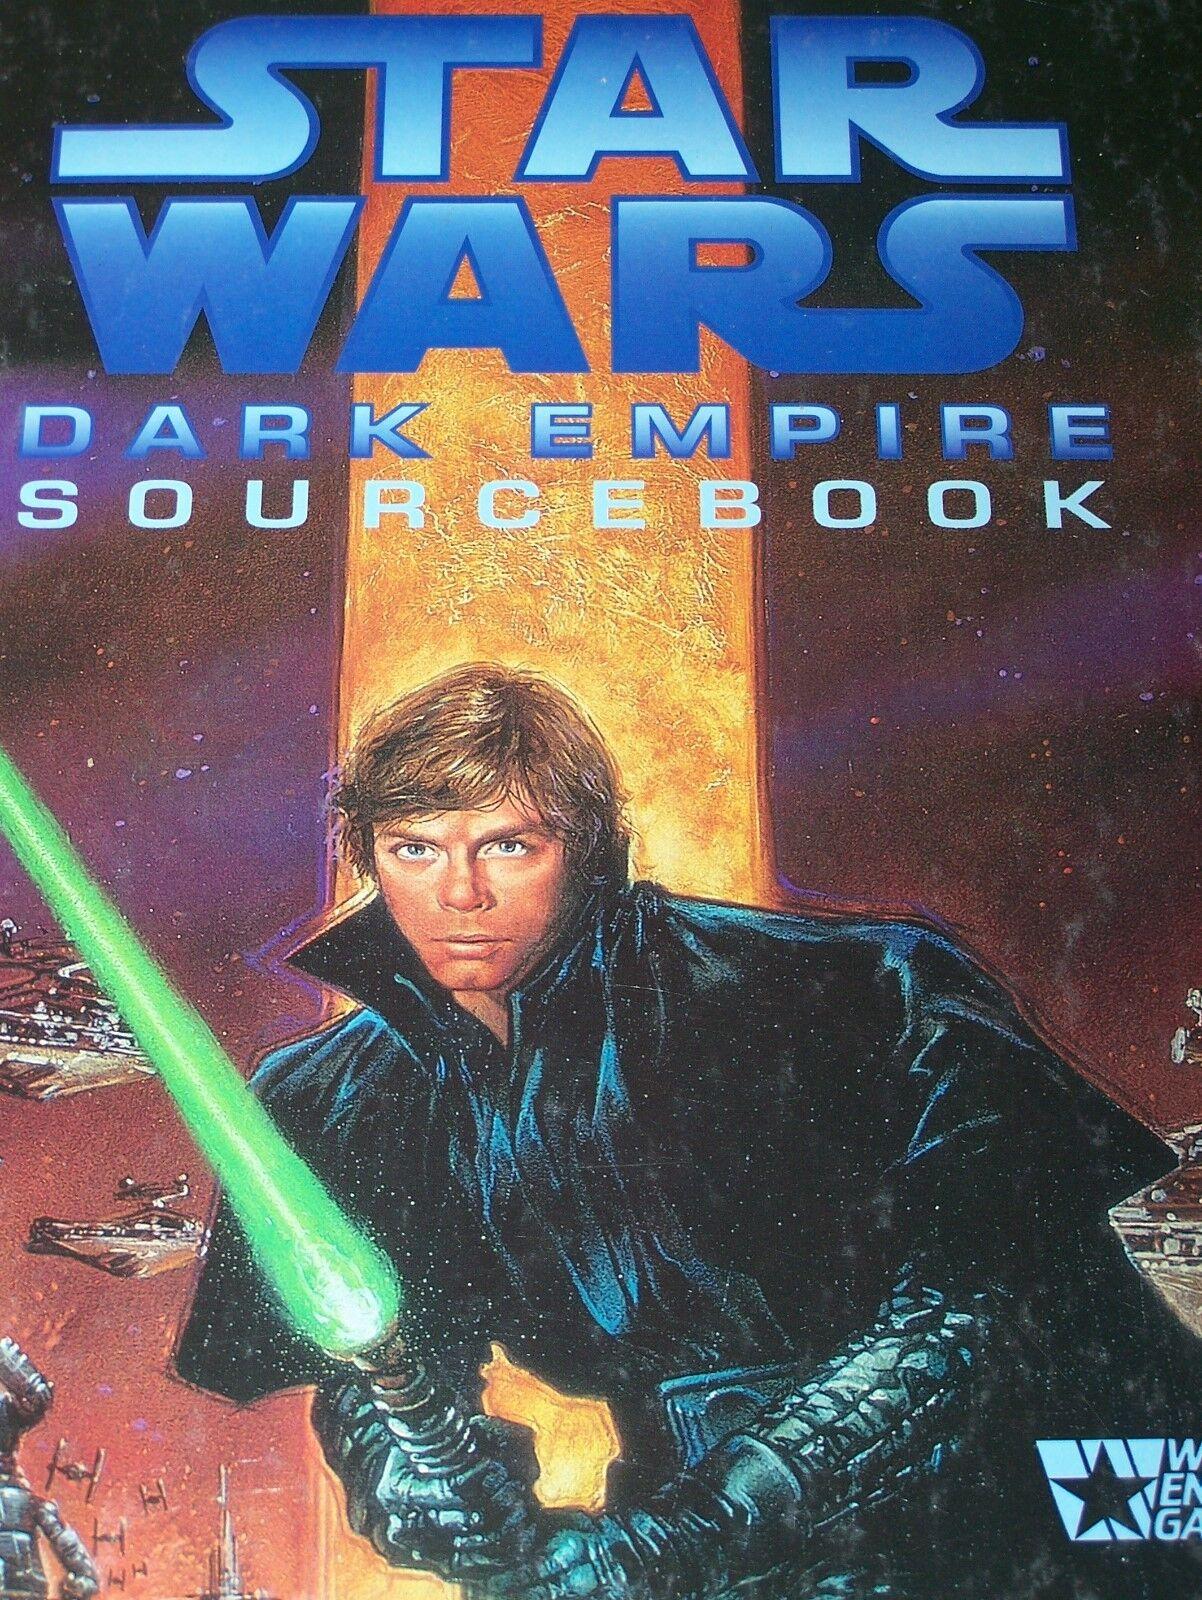 Star Wars RPG Hardcover Sourcebook Dark Empire Last Command Dark Force Rising +2